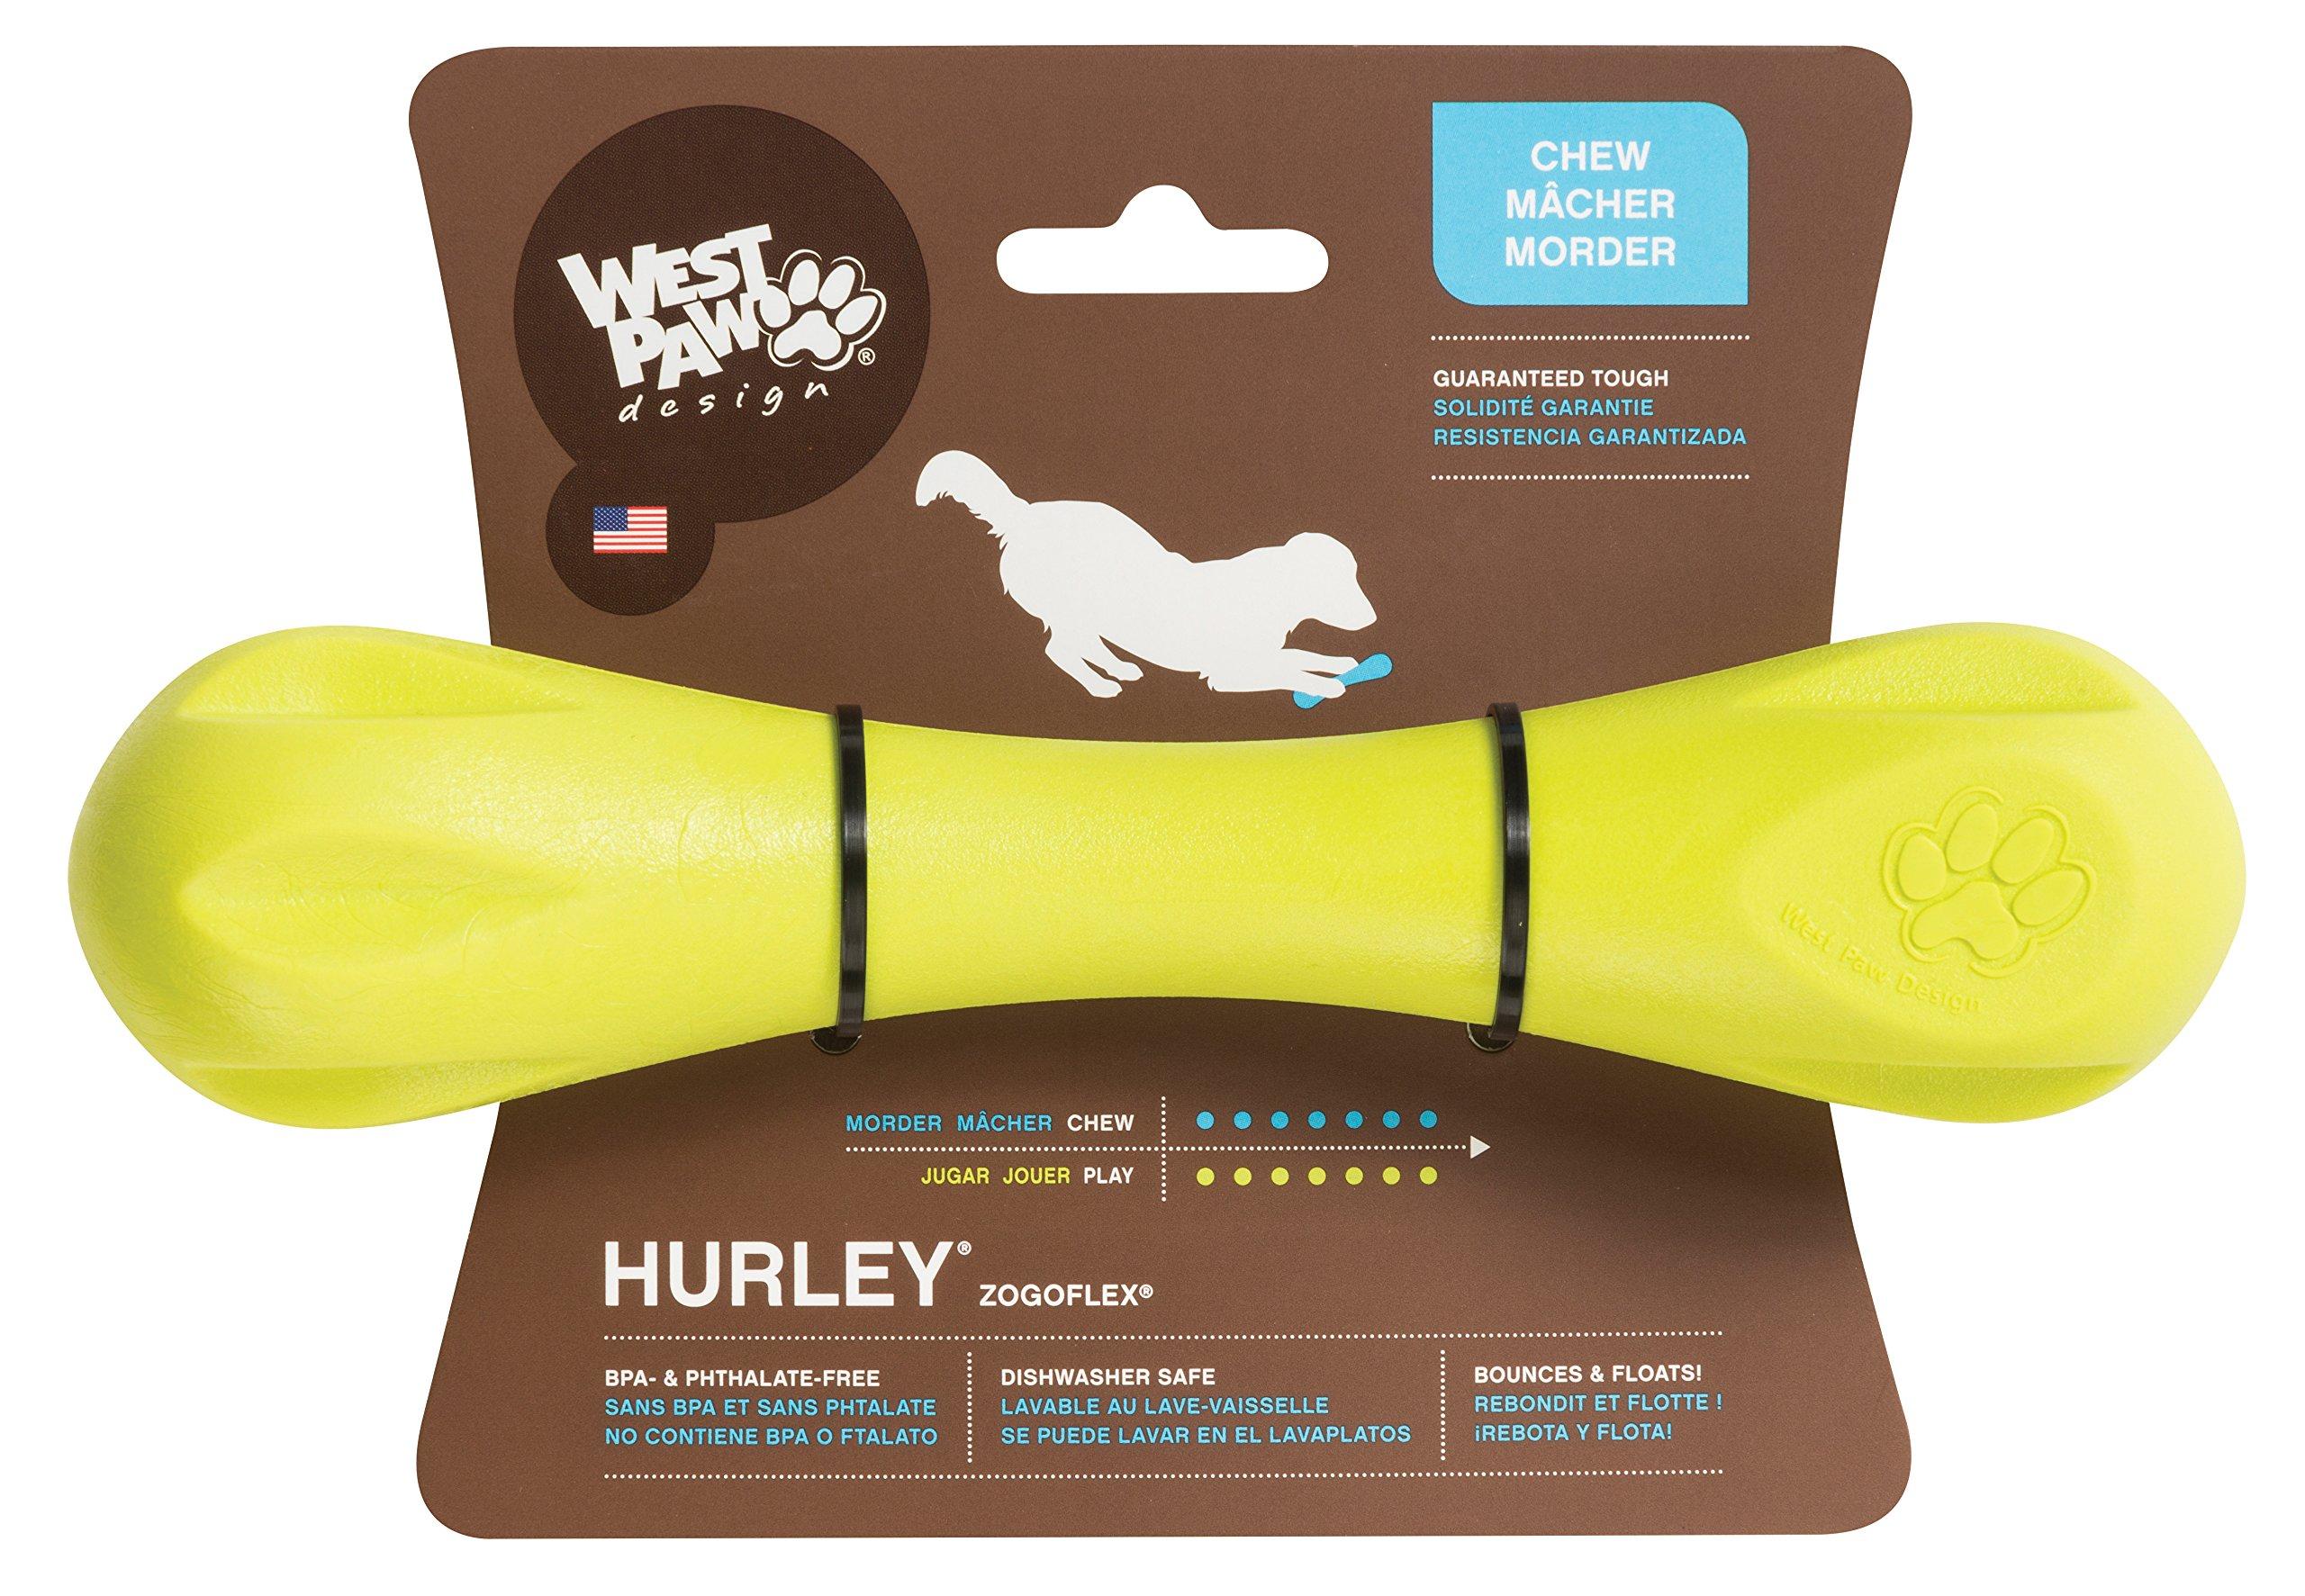 West Paw Design Zogoflex Hurley Guaranteed Tough Dog Bone Chew Toy Granny Smith